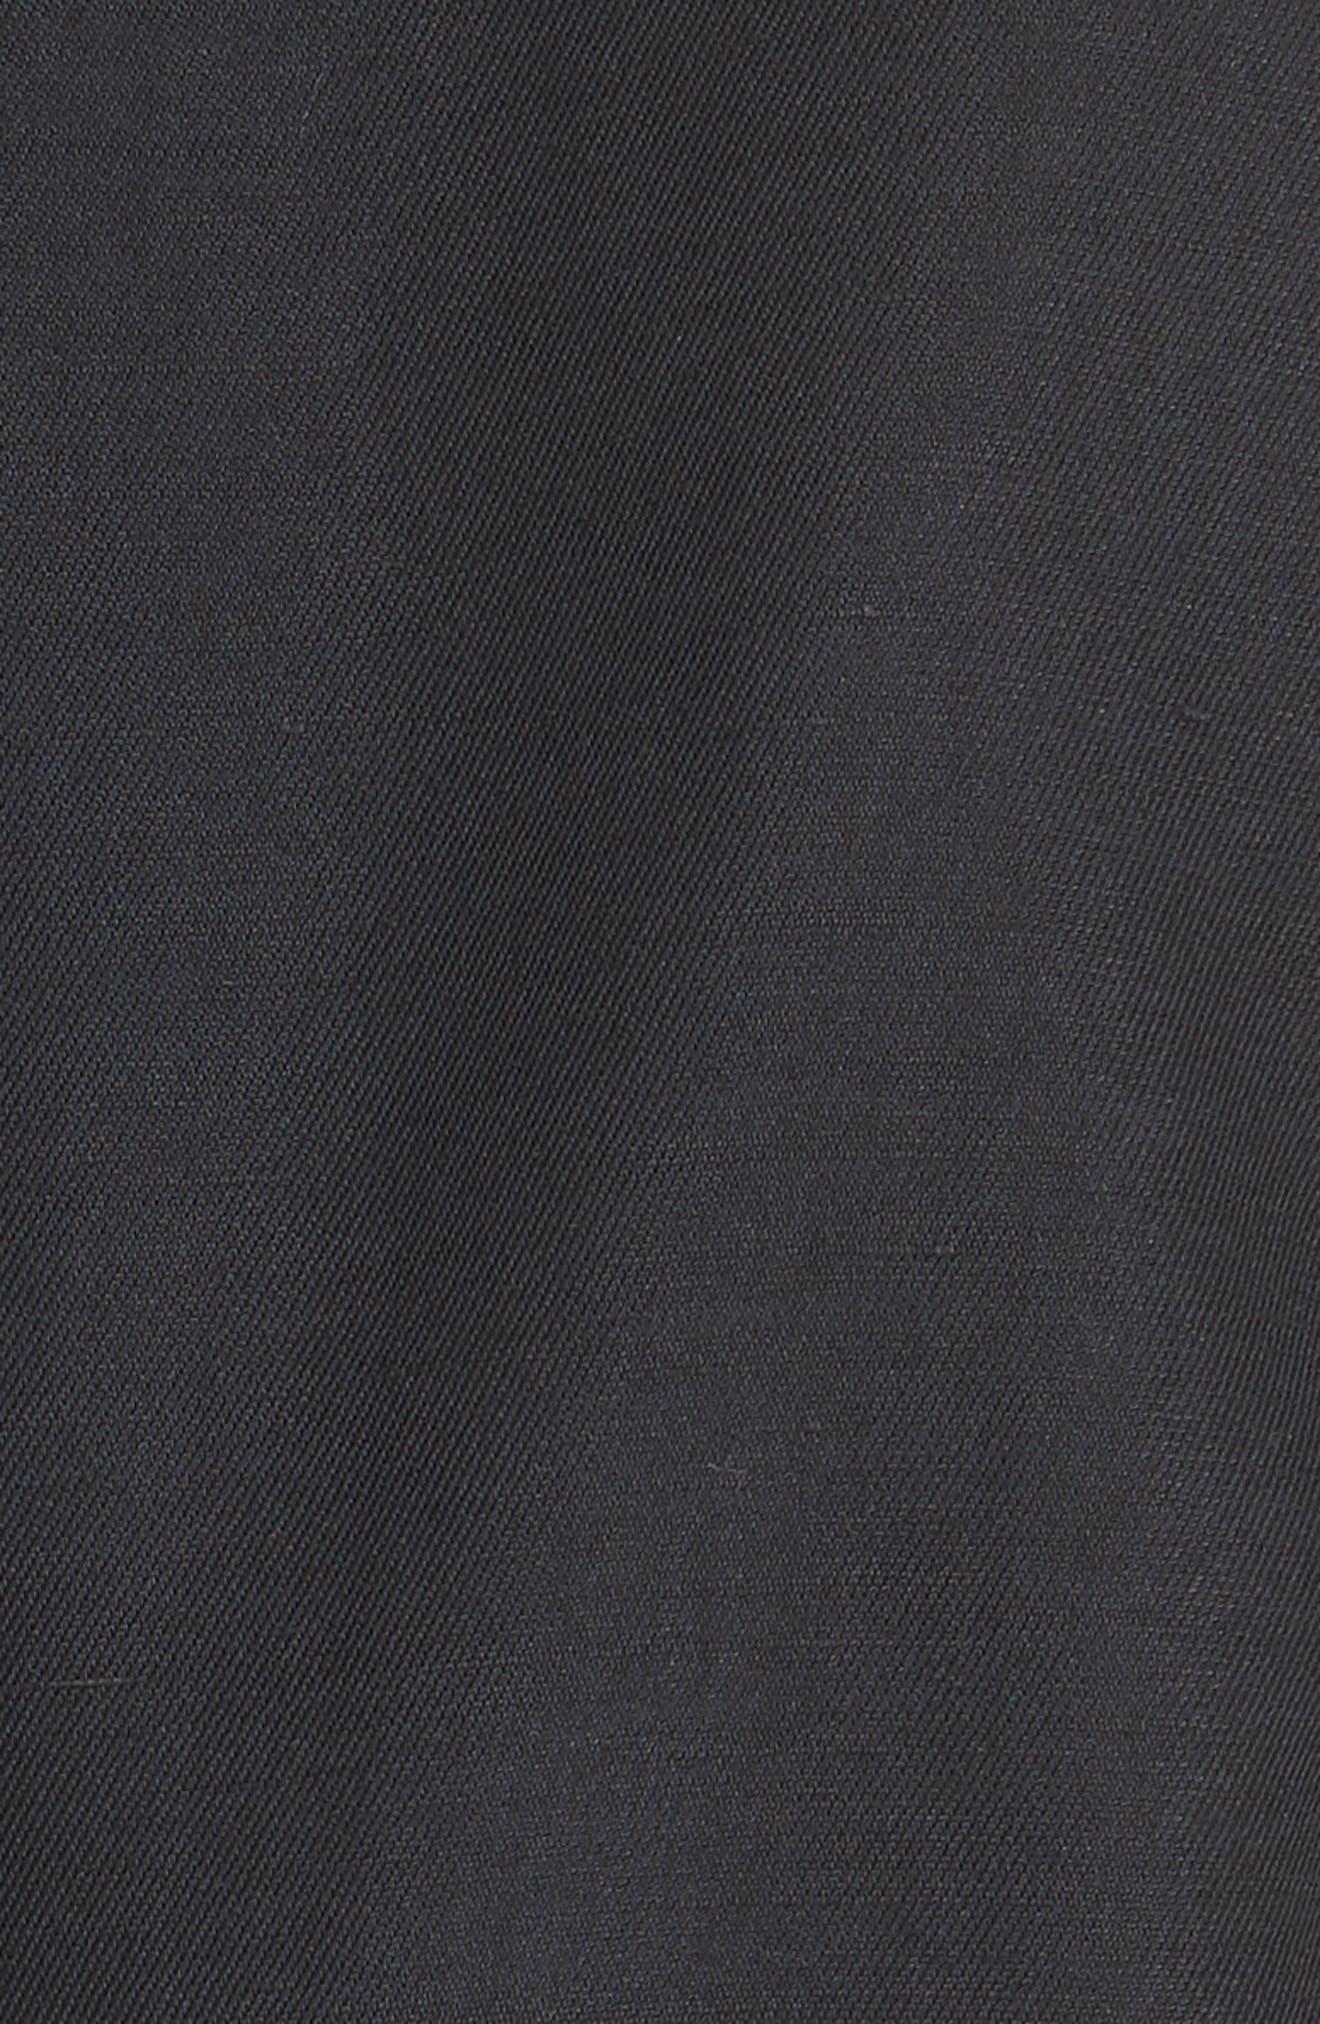 Lian Cotton & Linen Blazer,                             Alternate thumbnail 6, color,                             001